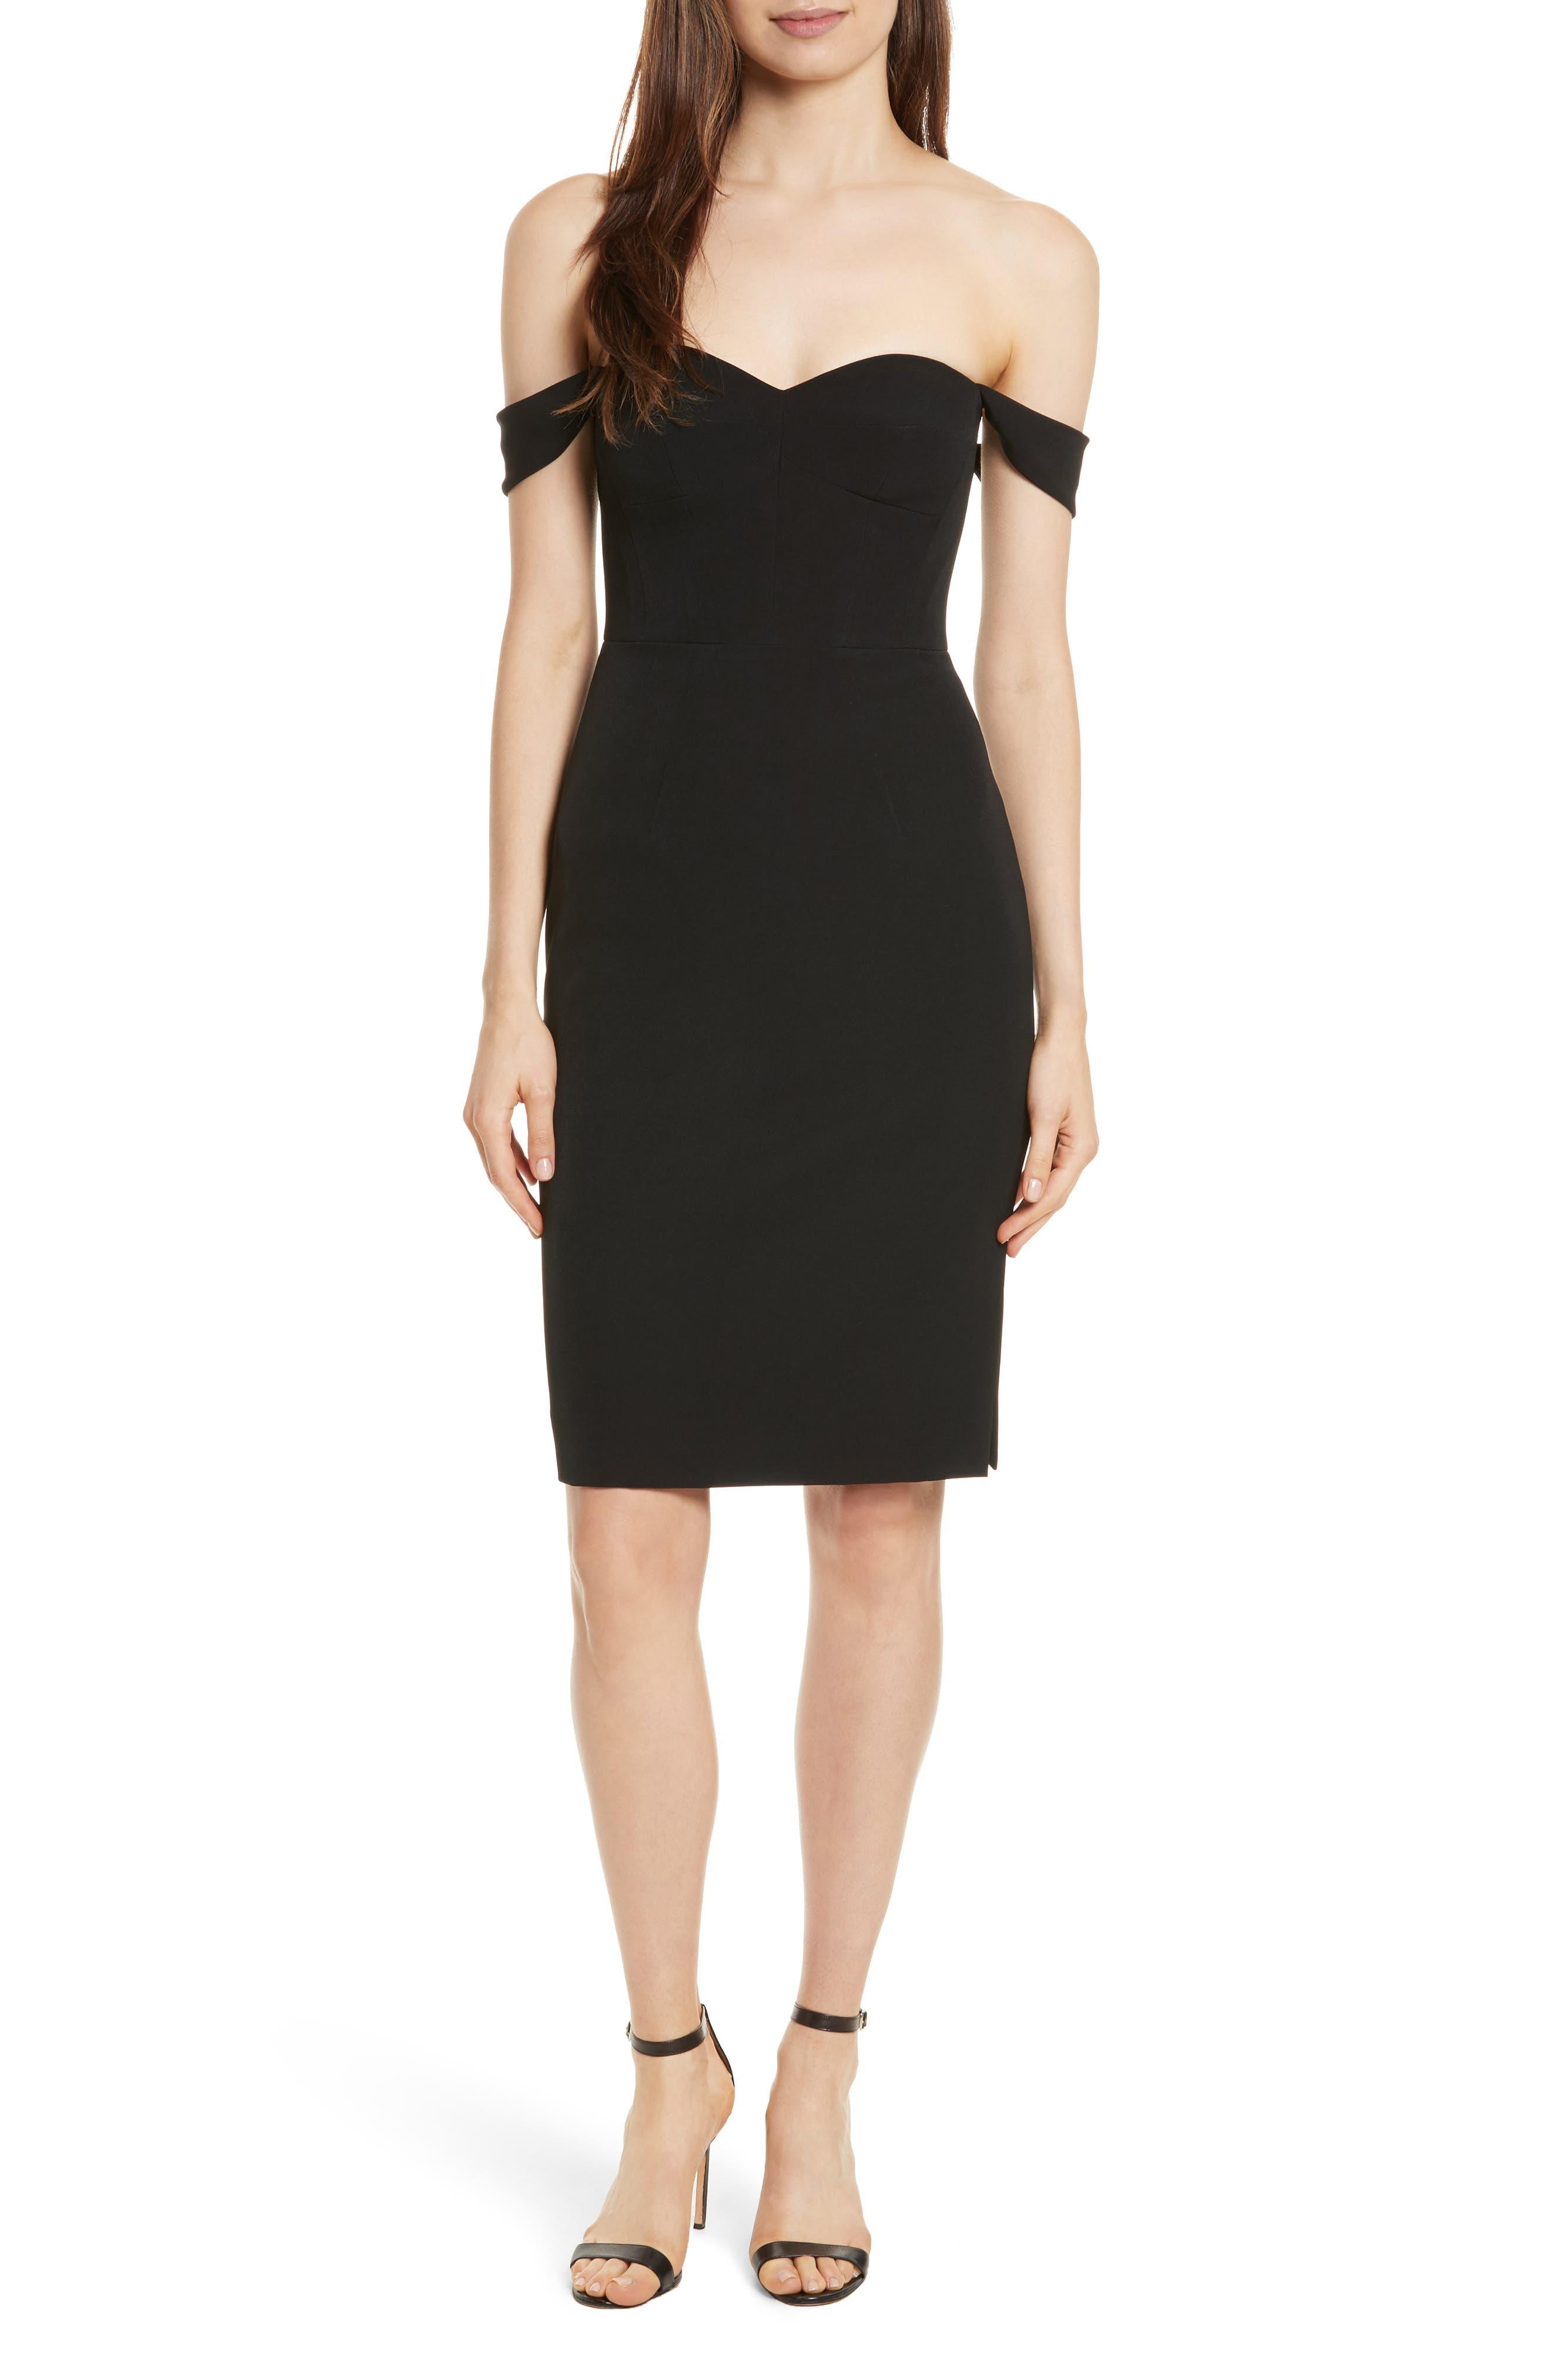 Karen Italian Cady Off the Shoulder Dress,                             Main thumbnail 1, color,                             Black